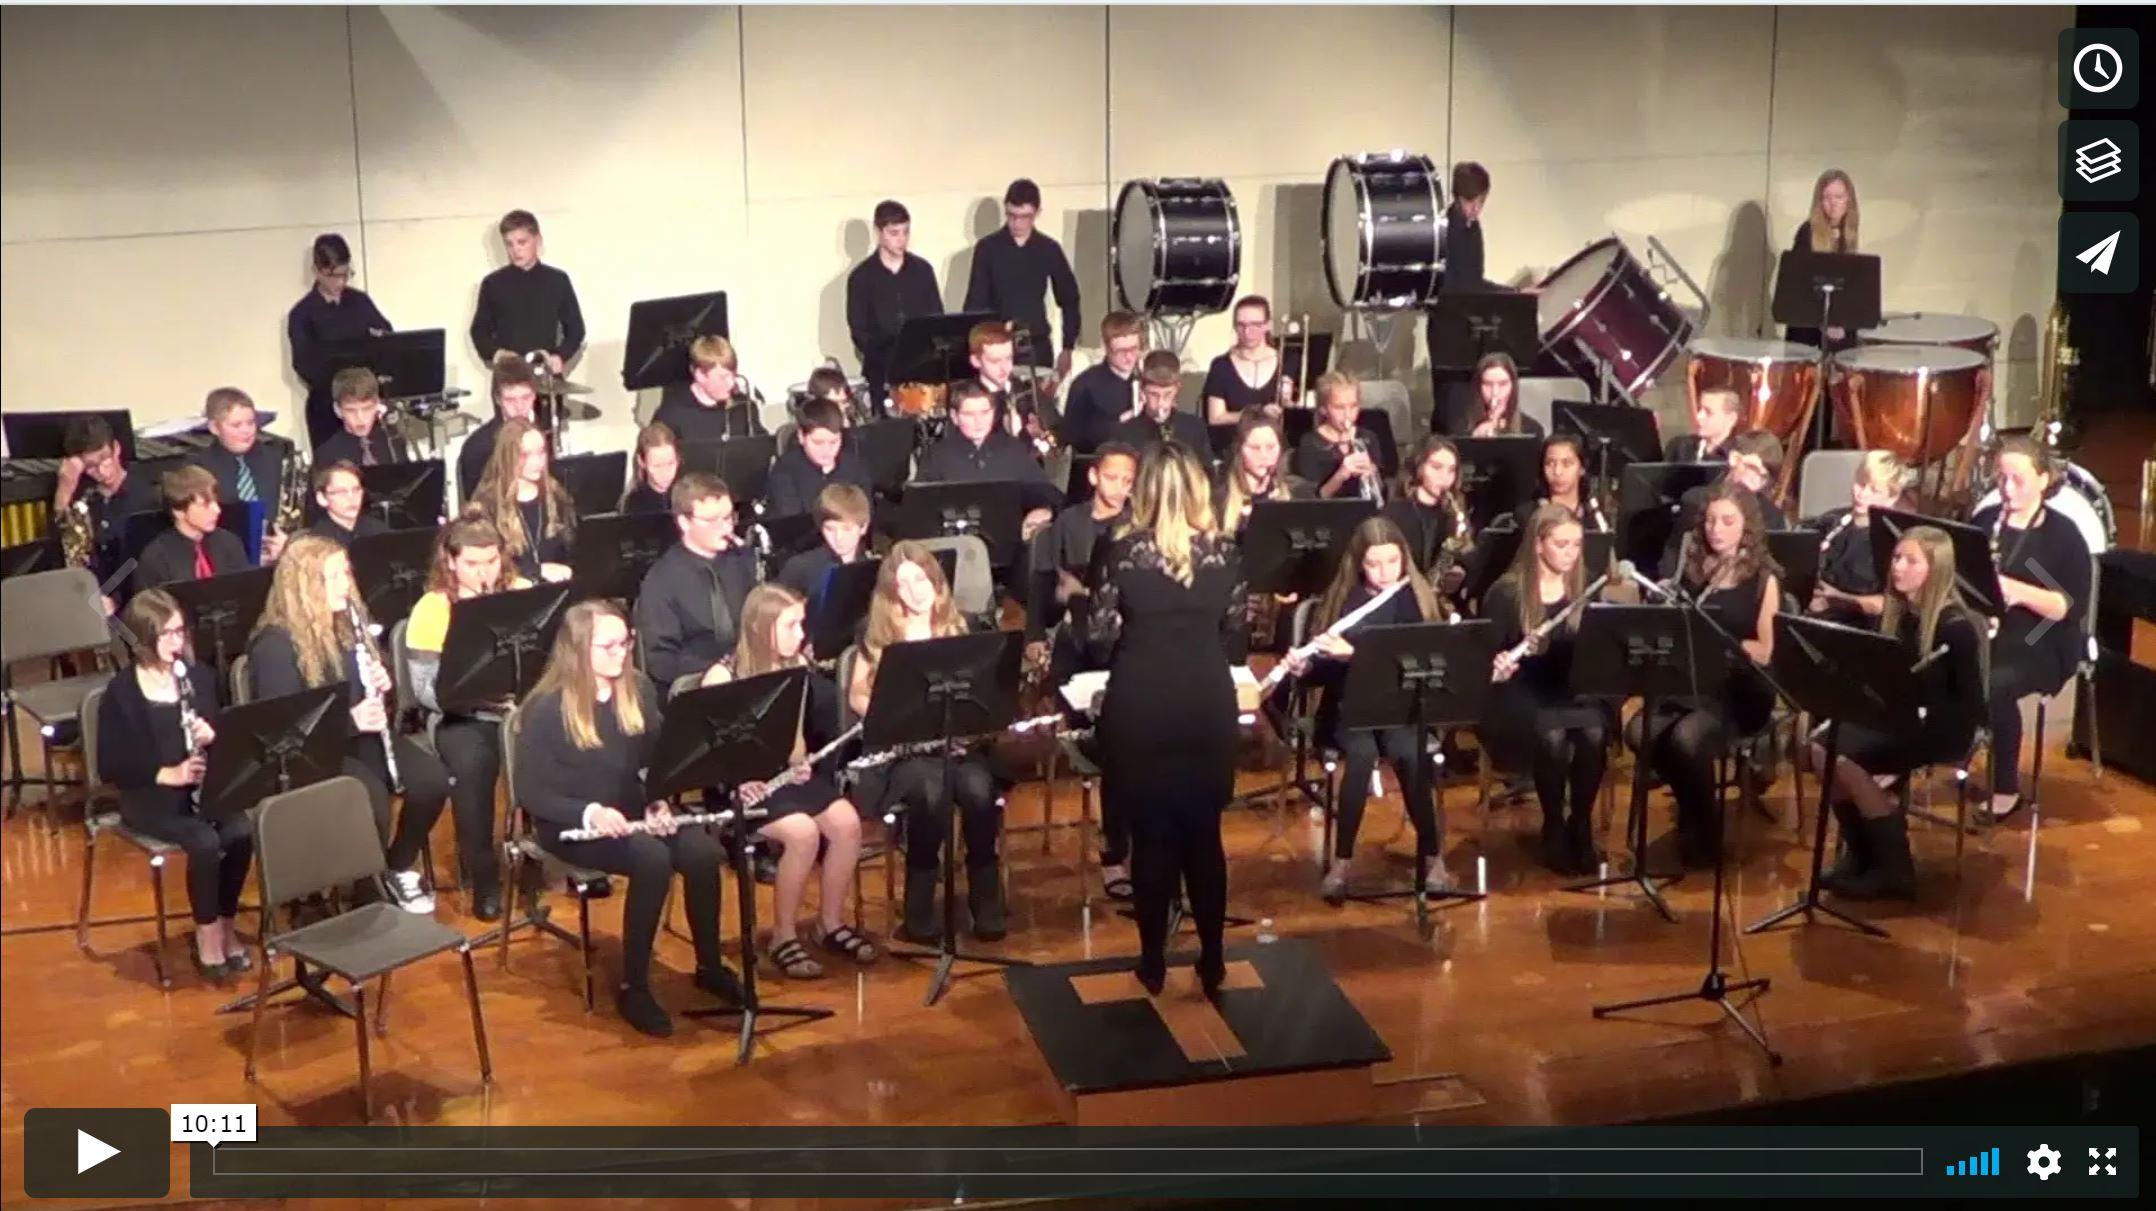 Ortonville School Winter Band Concert